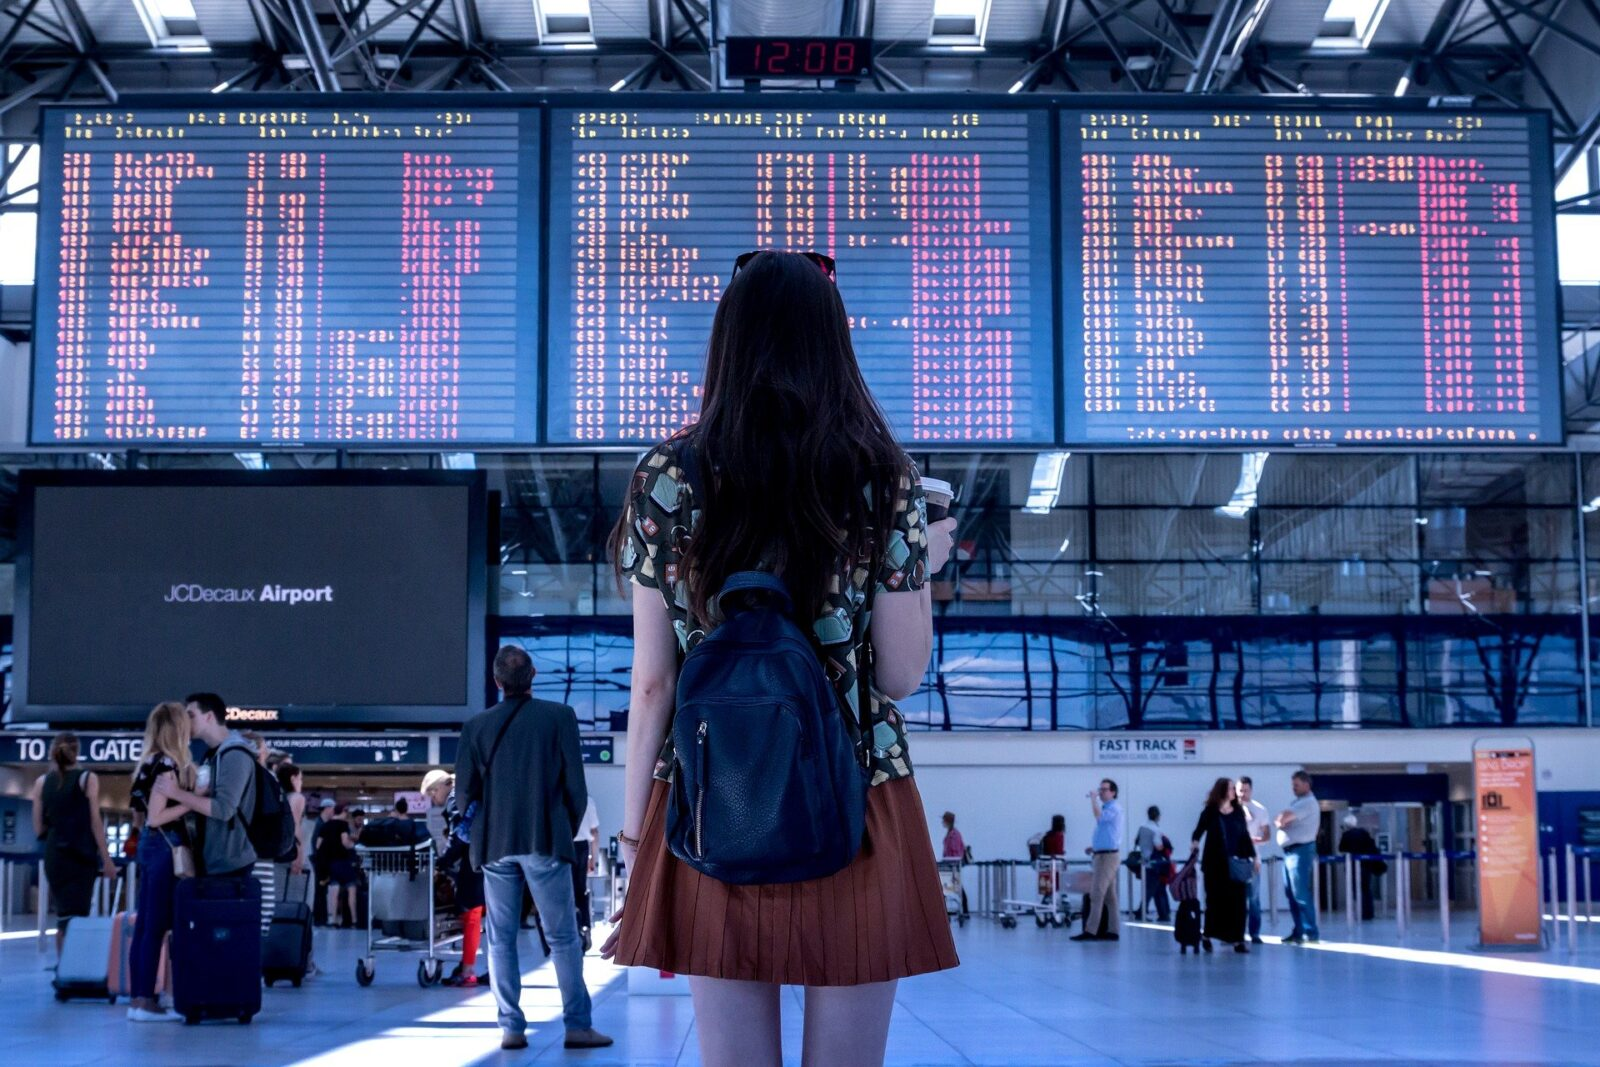 travel-blog-online-essential-traveling-tips